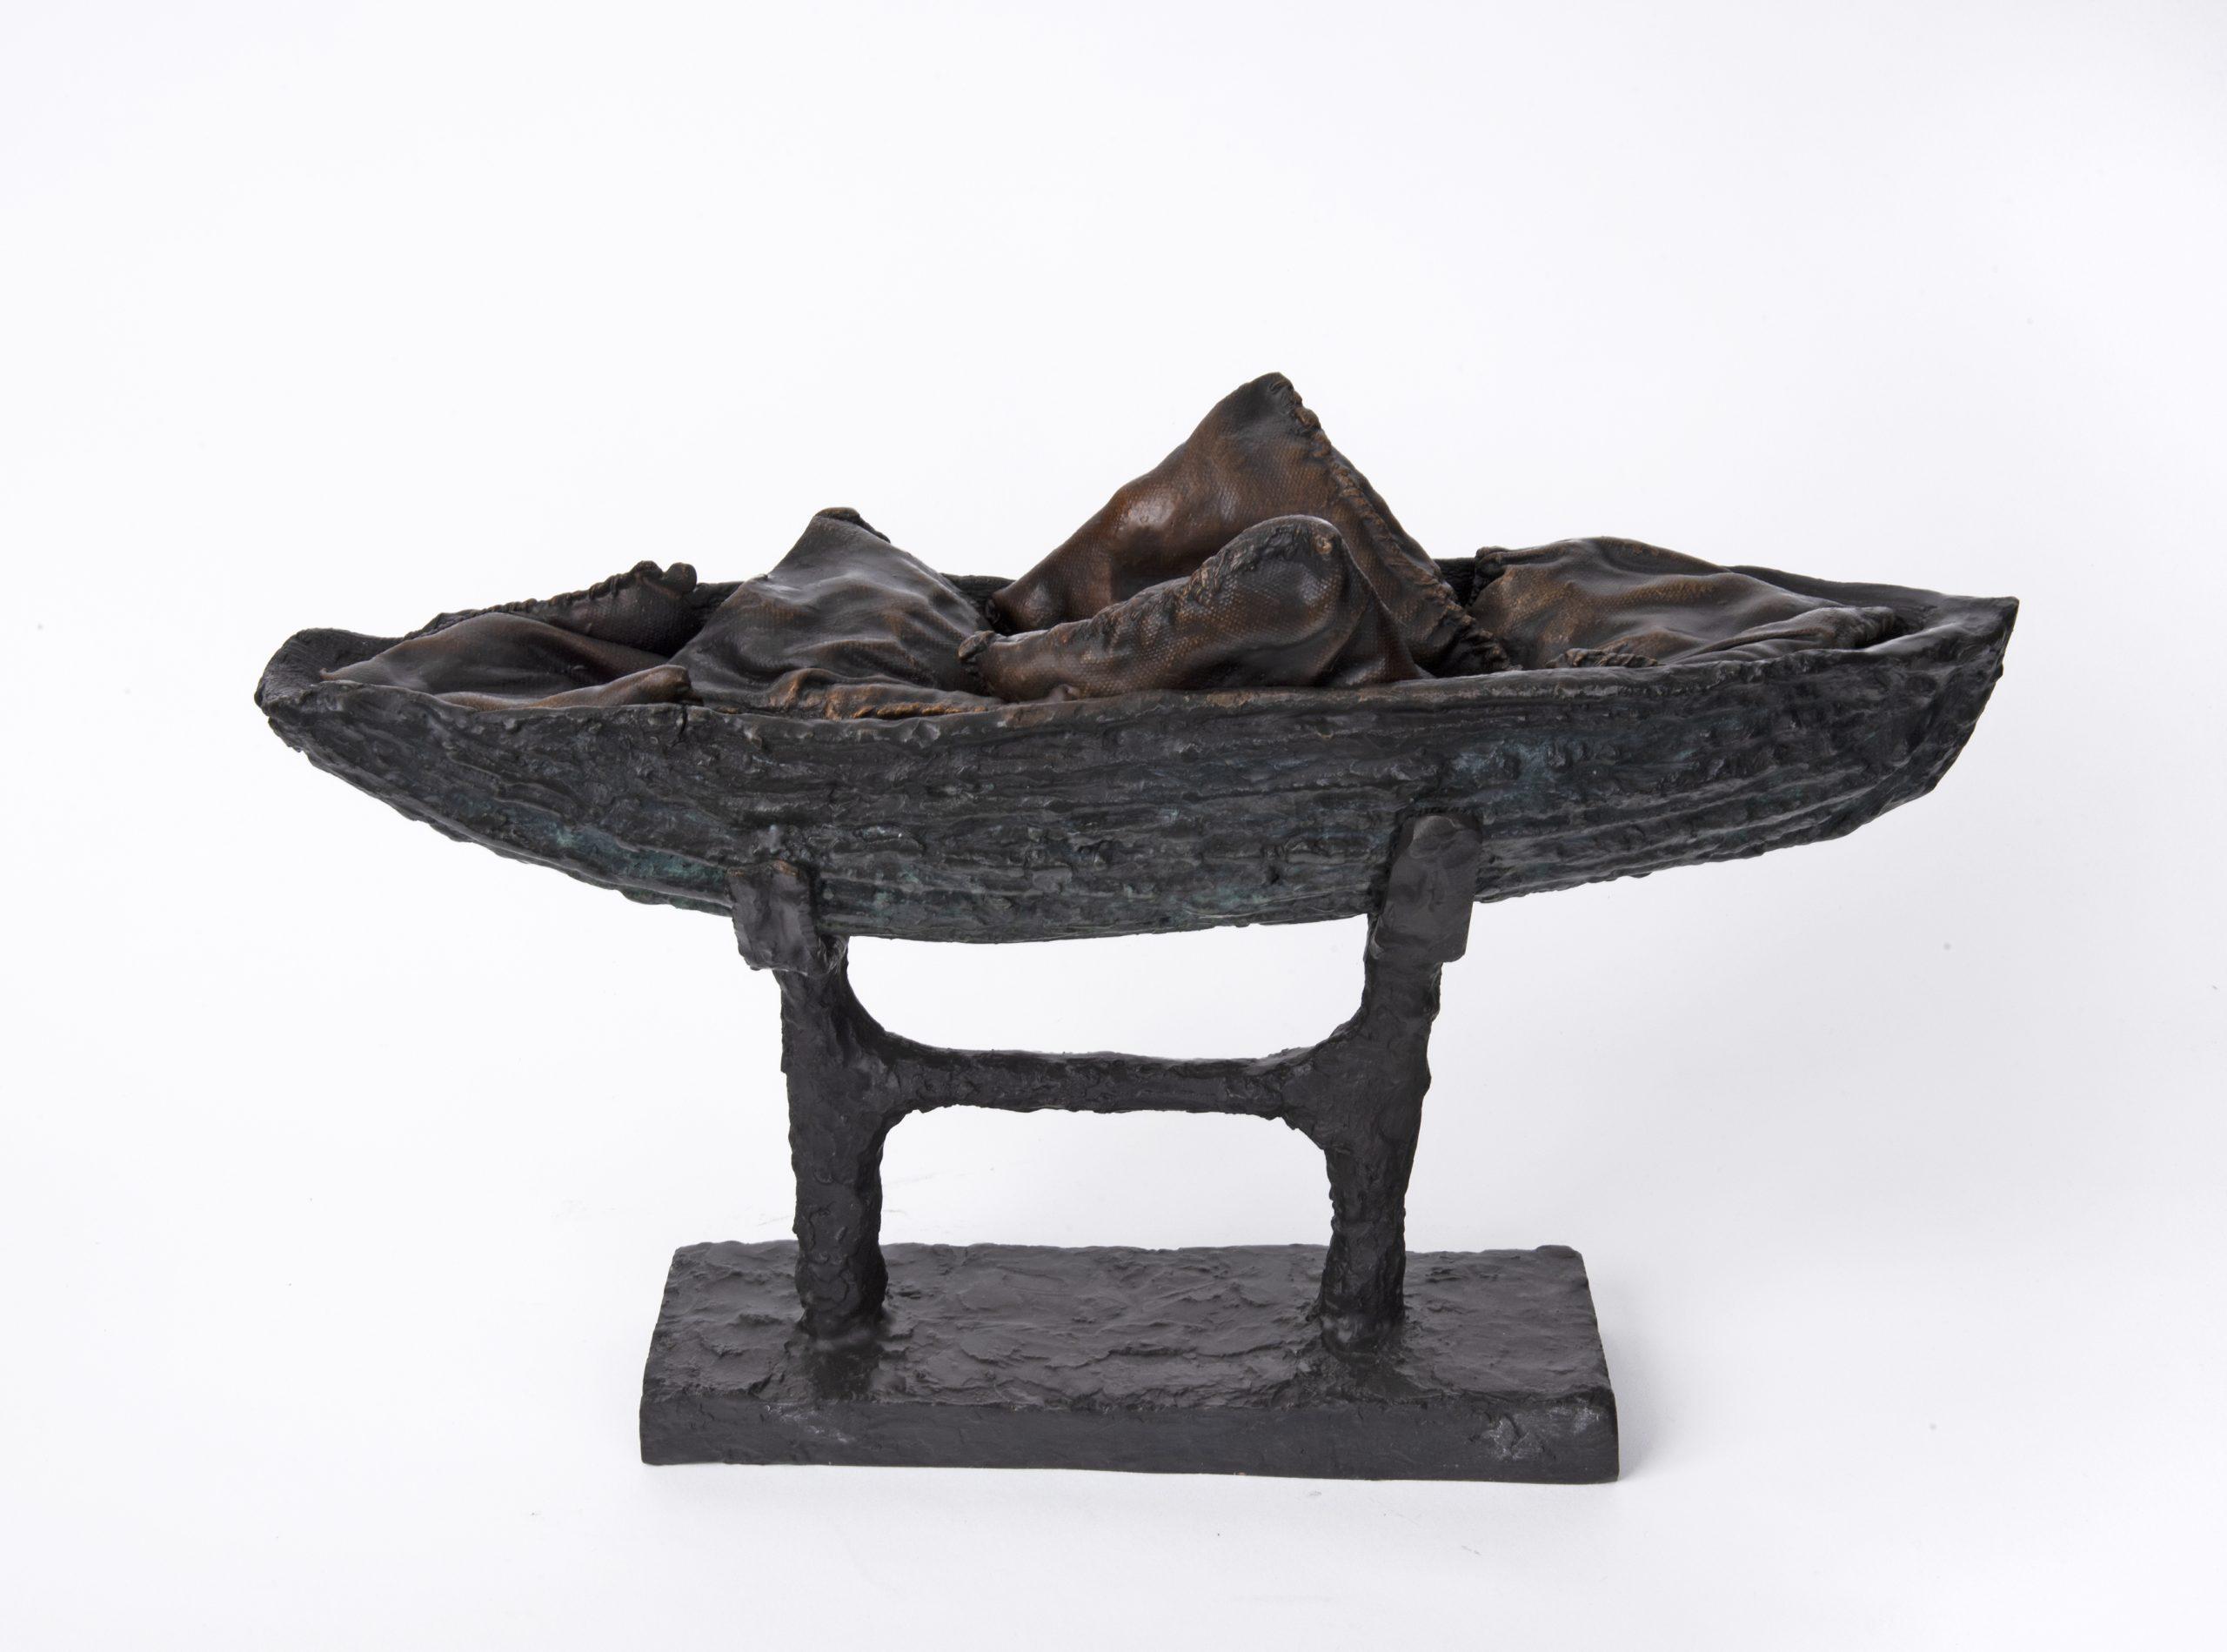 Beatrice Magalotti_Mirgration Series 1_Bronze_25 x 41 x 11 cm